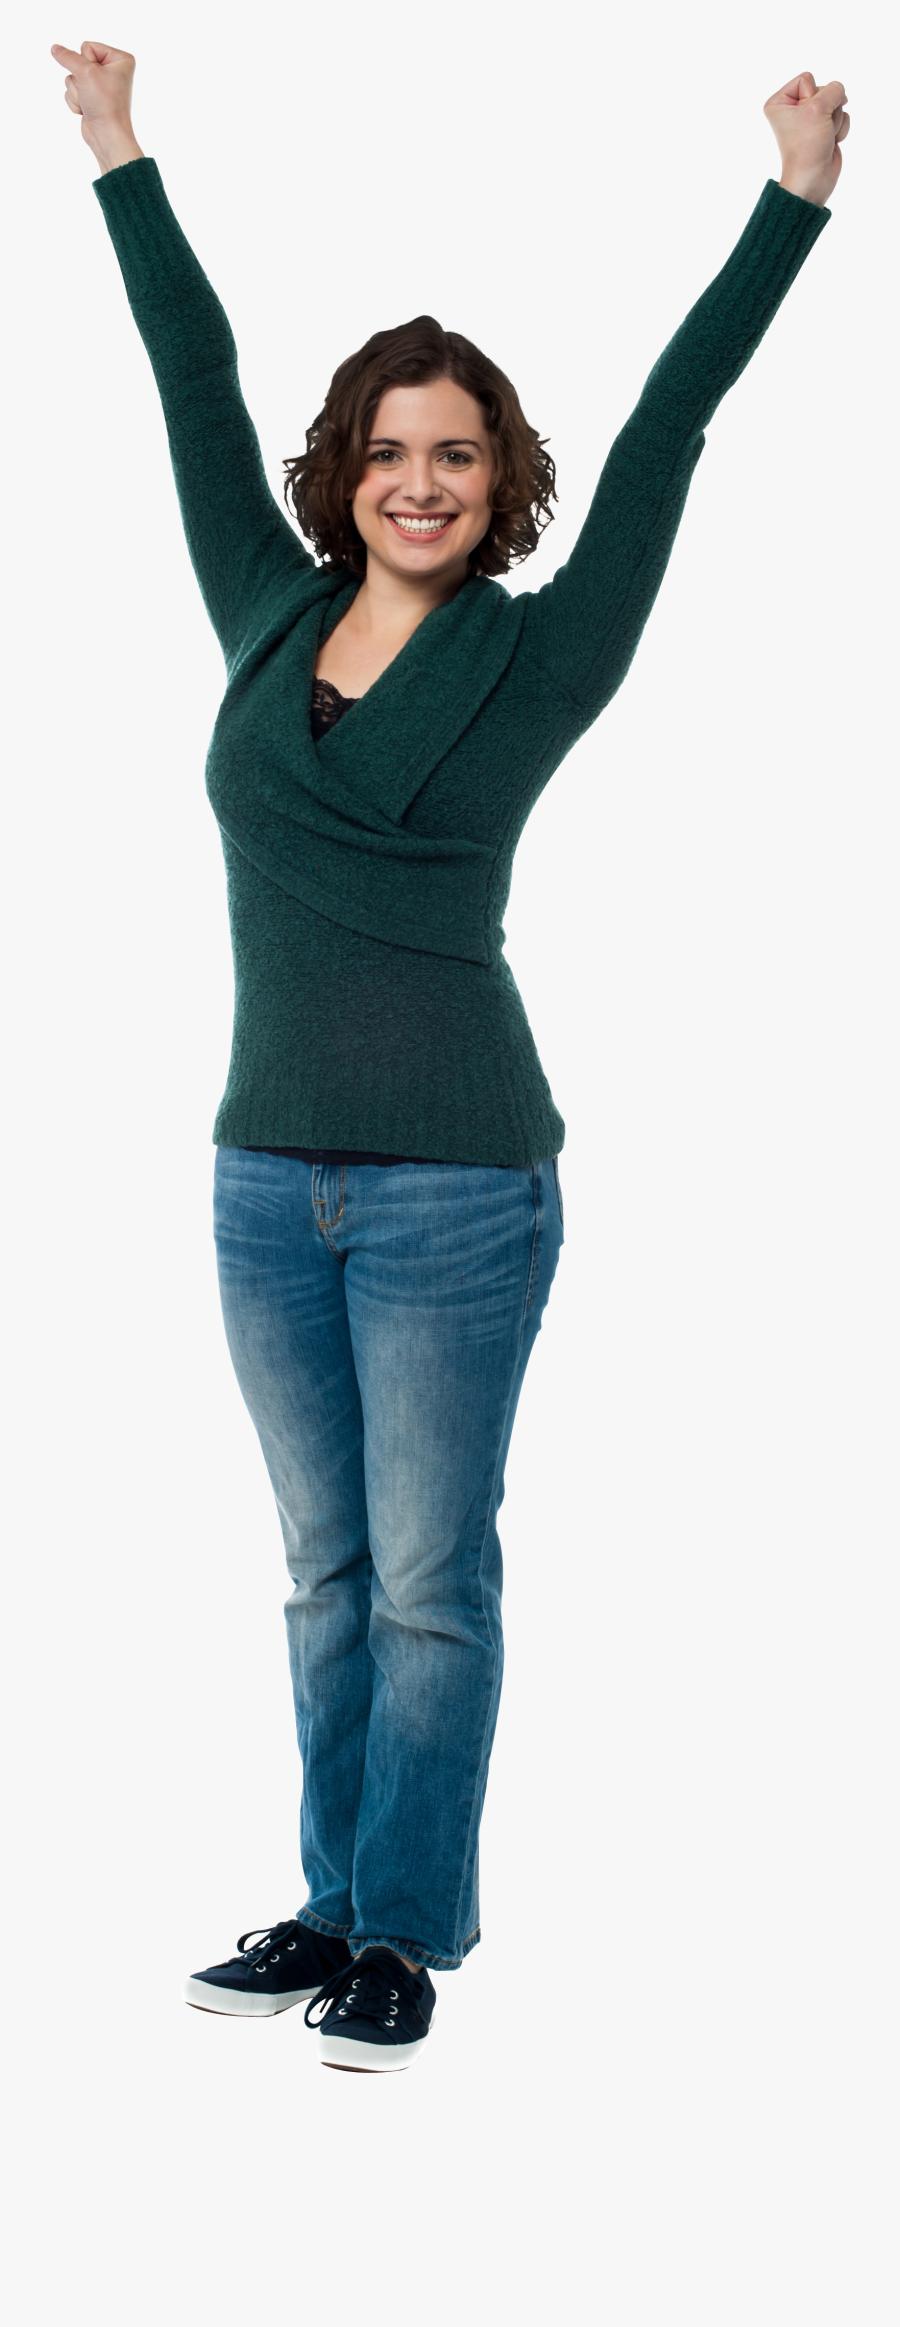 Happy Person Png Transparent Images - Woman Stock Photo Png, Transparent Clipart